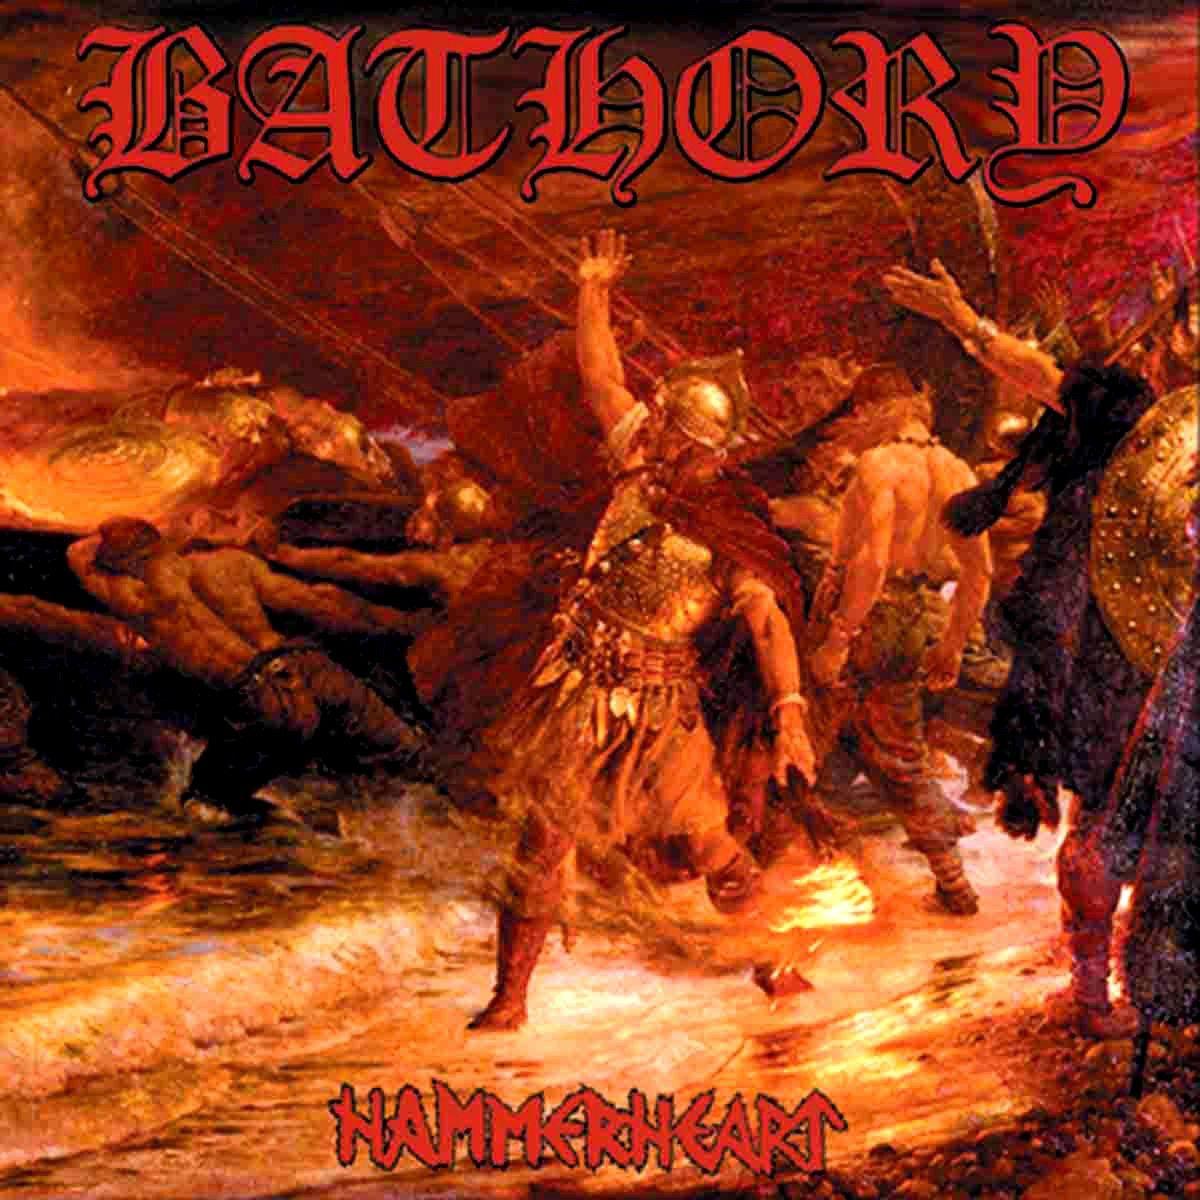 Hammerheart (Bathory) | Bathory, Viking metal, Black metal